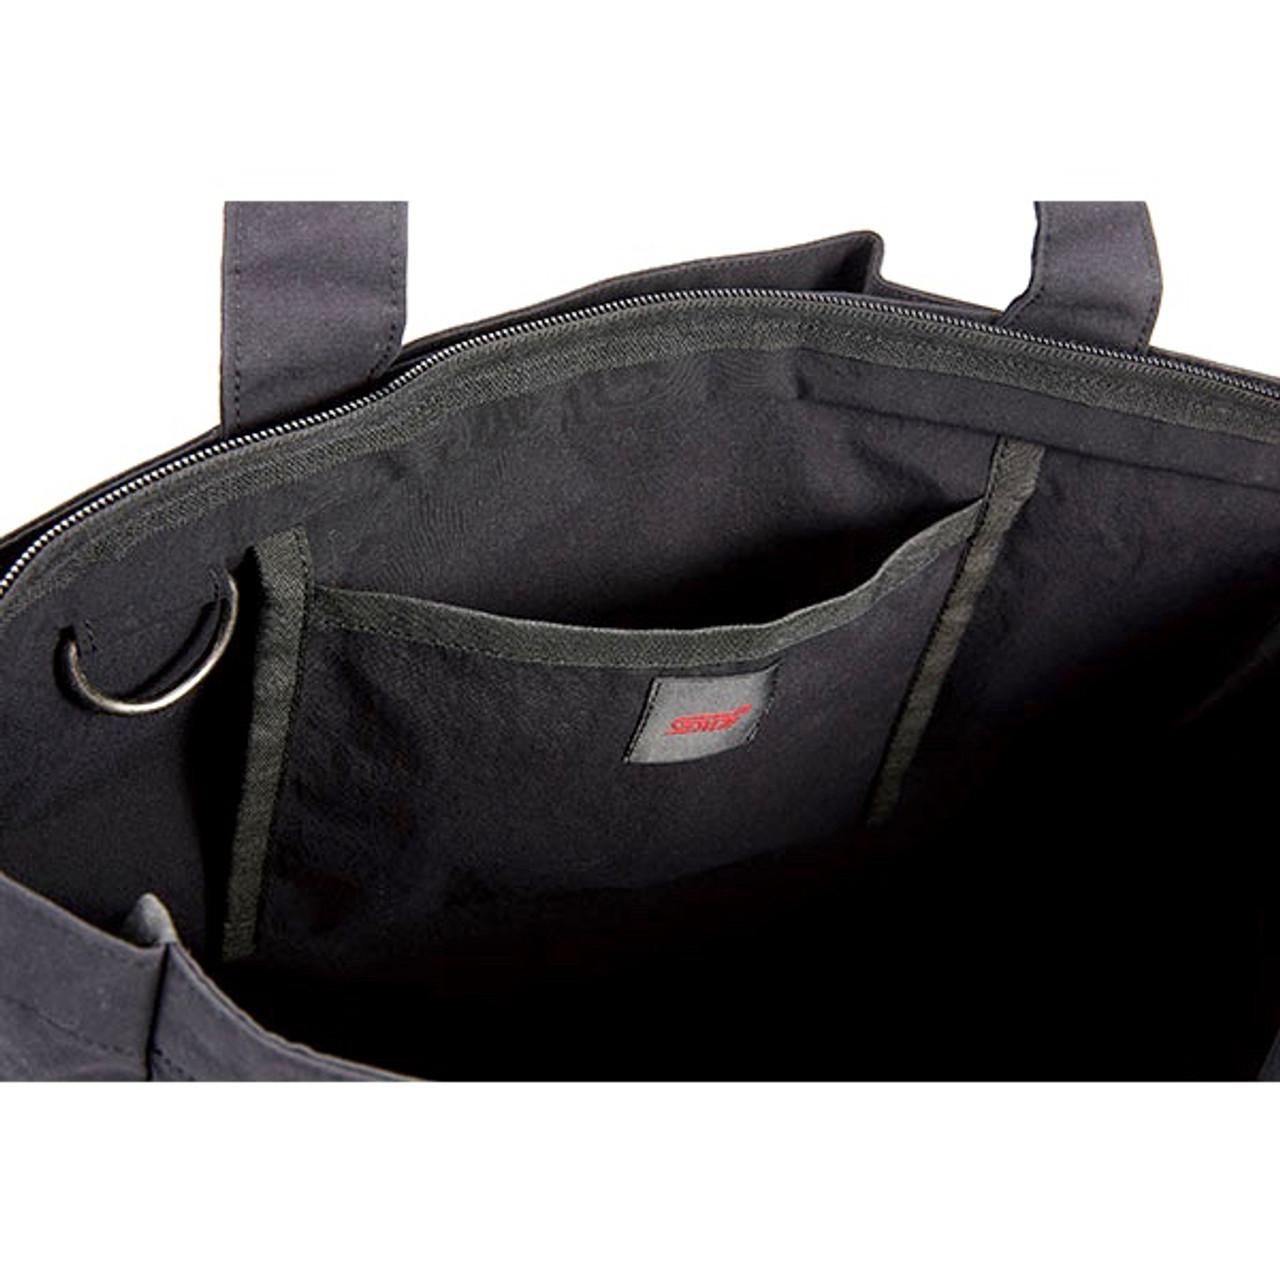 STSG18000700 STI Tote Bag Inner Pocket at AVOJDM.com